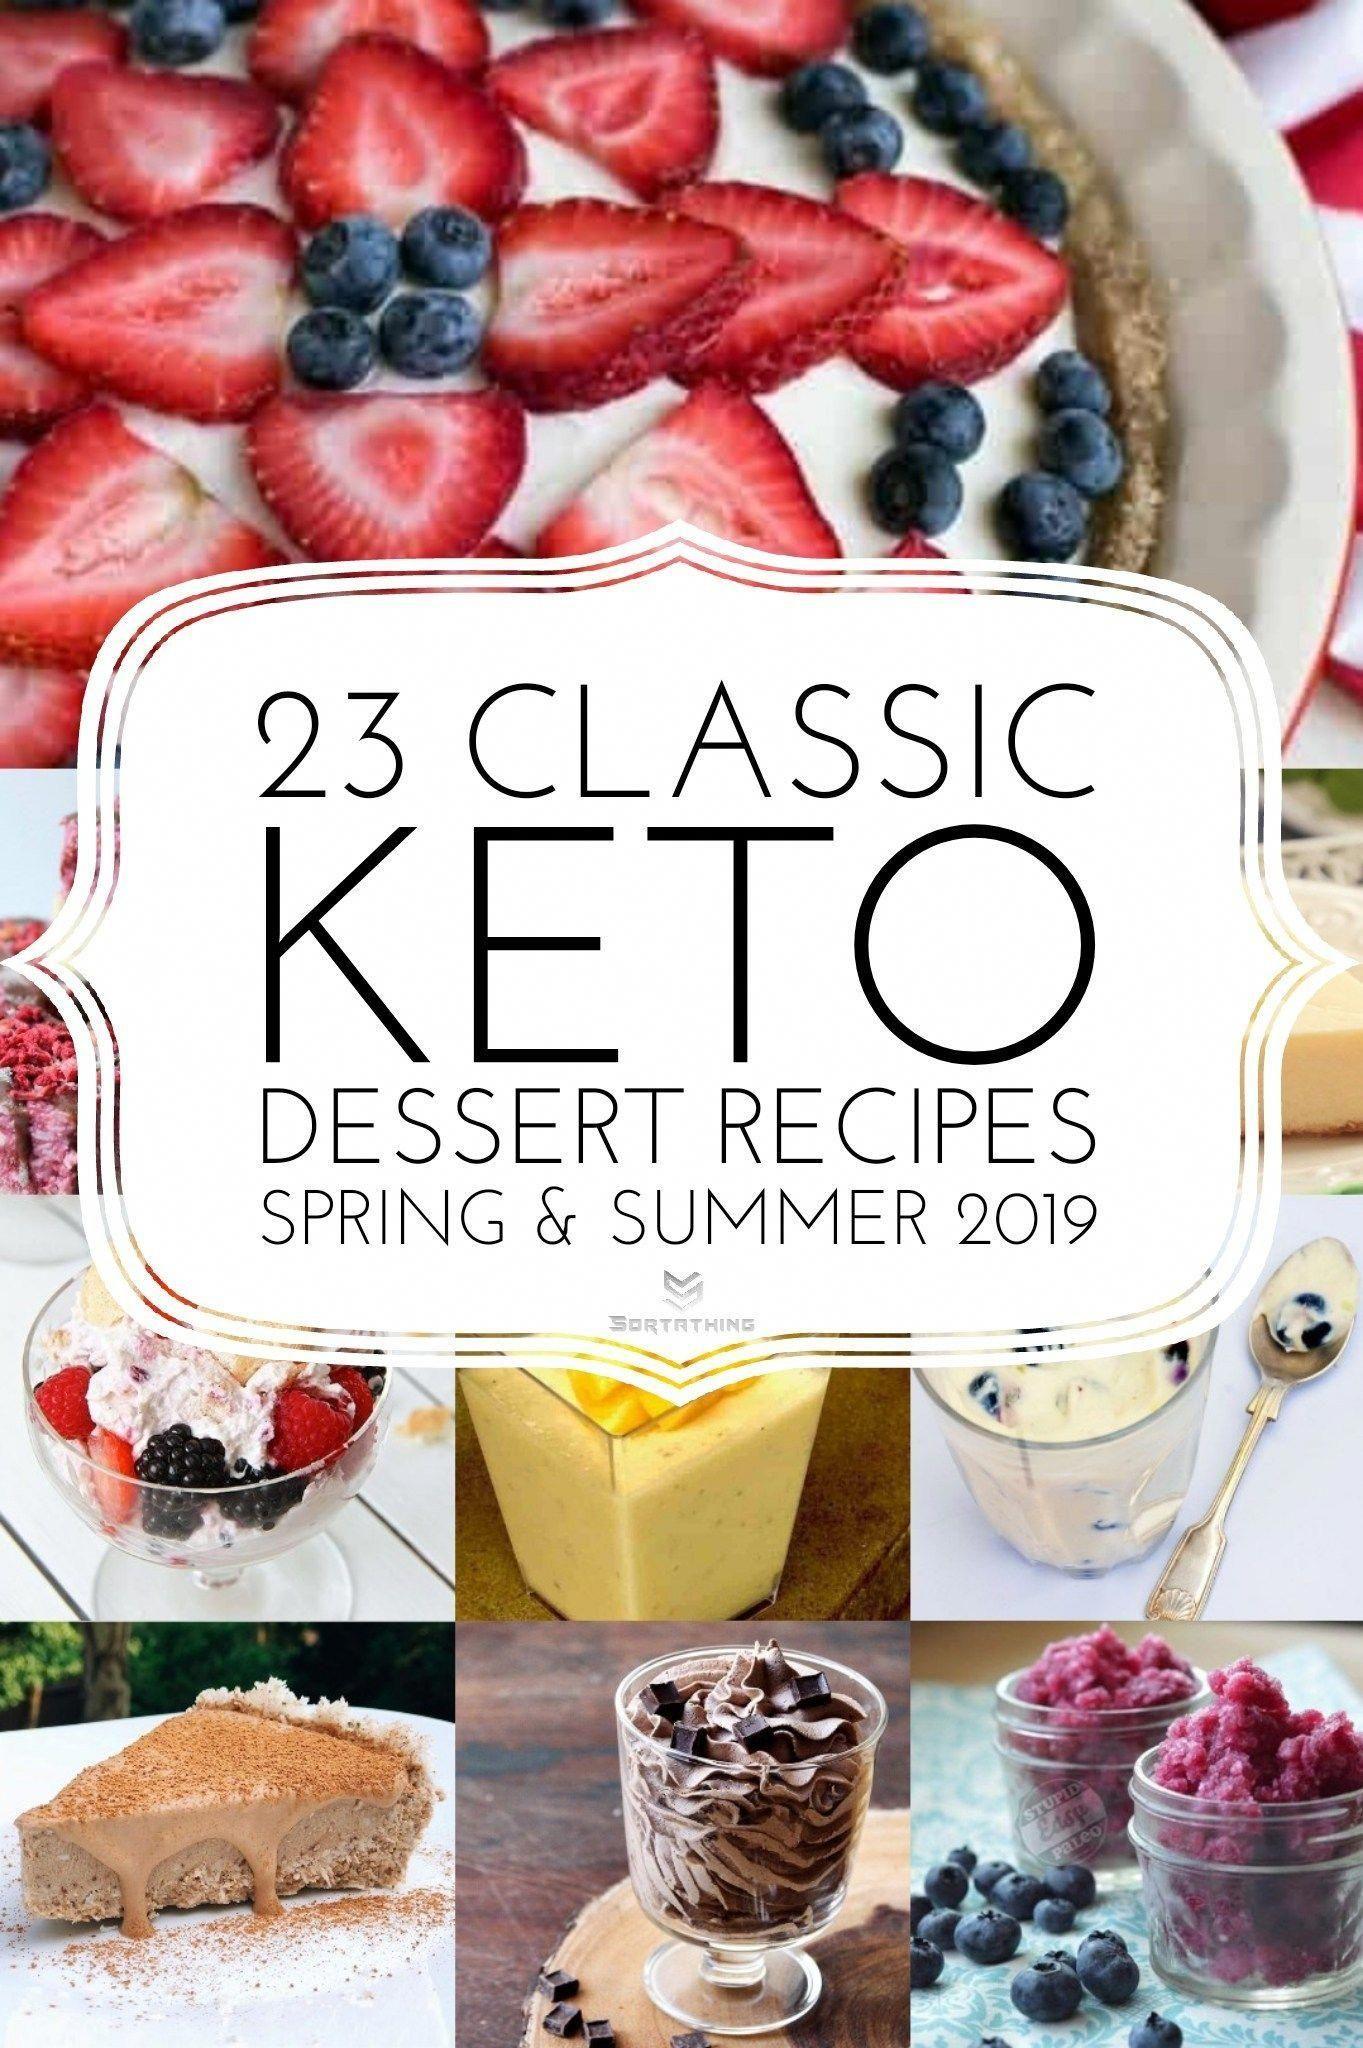 Keto Diet Meal Plan Near Me AKetog Desserts in 2020